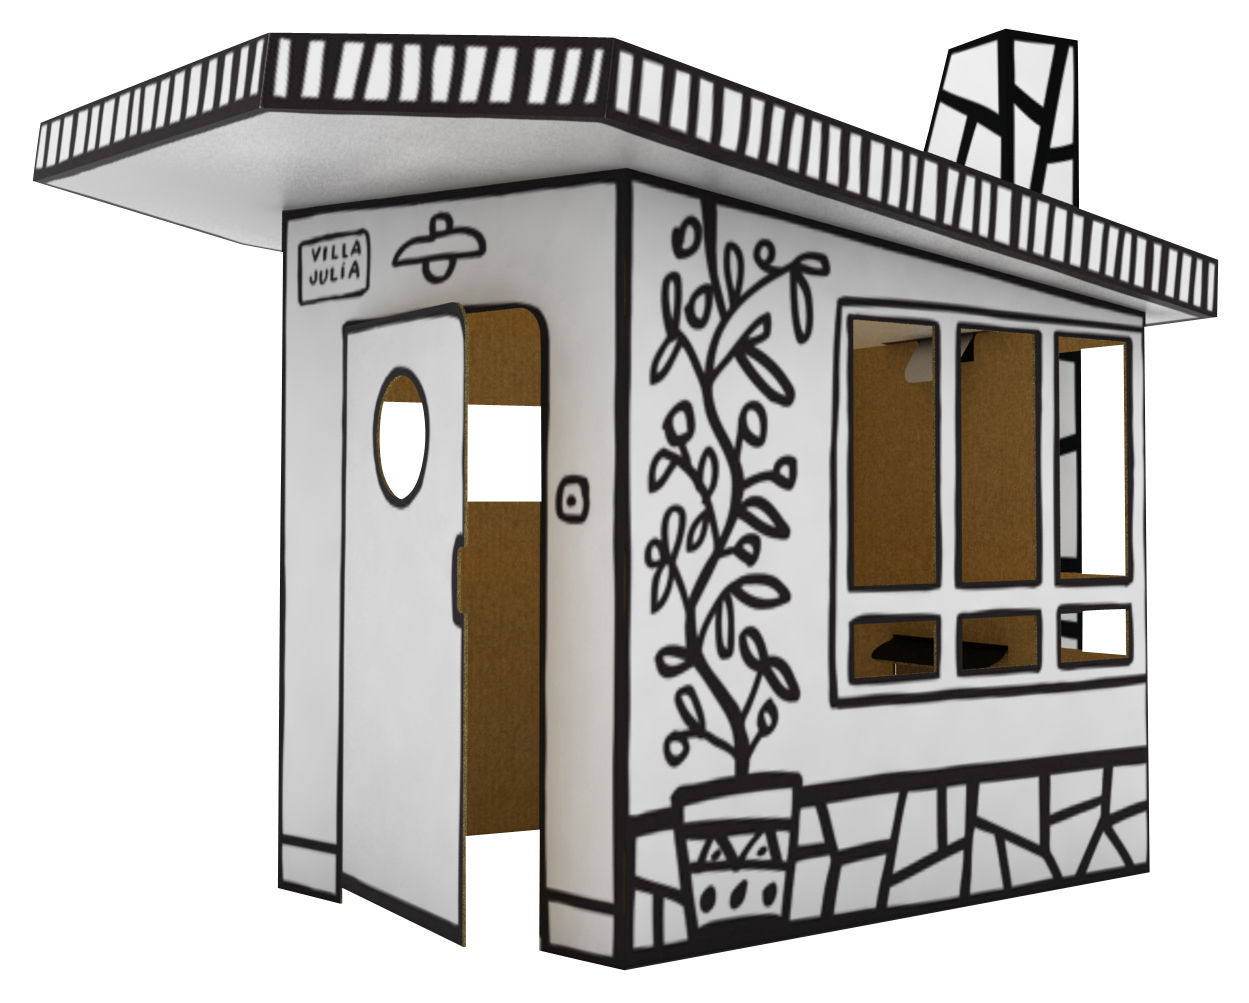 Furniture - Kids Furniture - Villa Julia Den by Magis Collection Me Too - Black & white - Cardboard